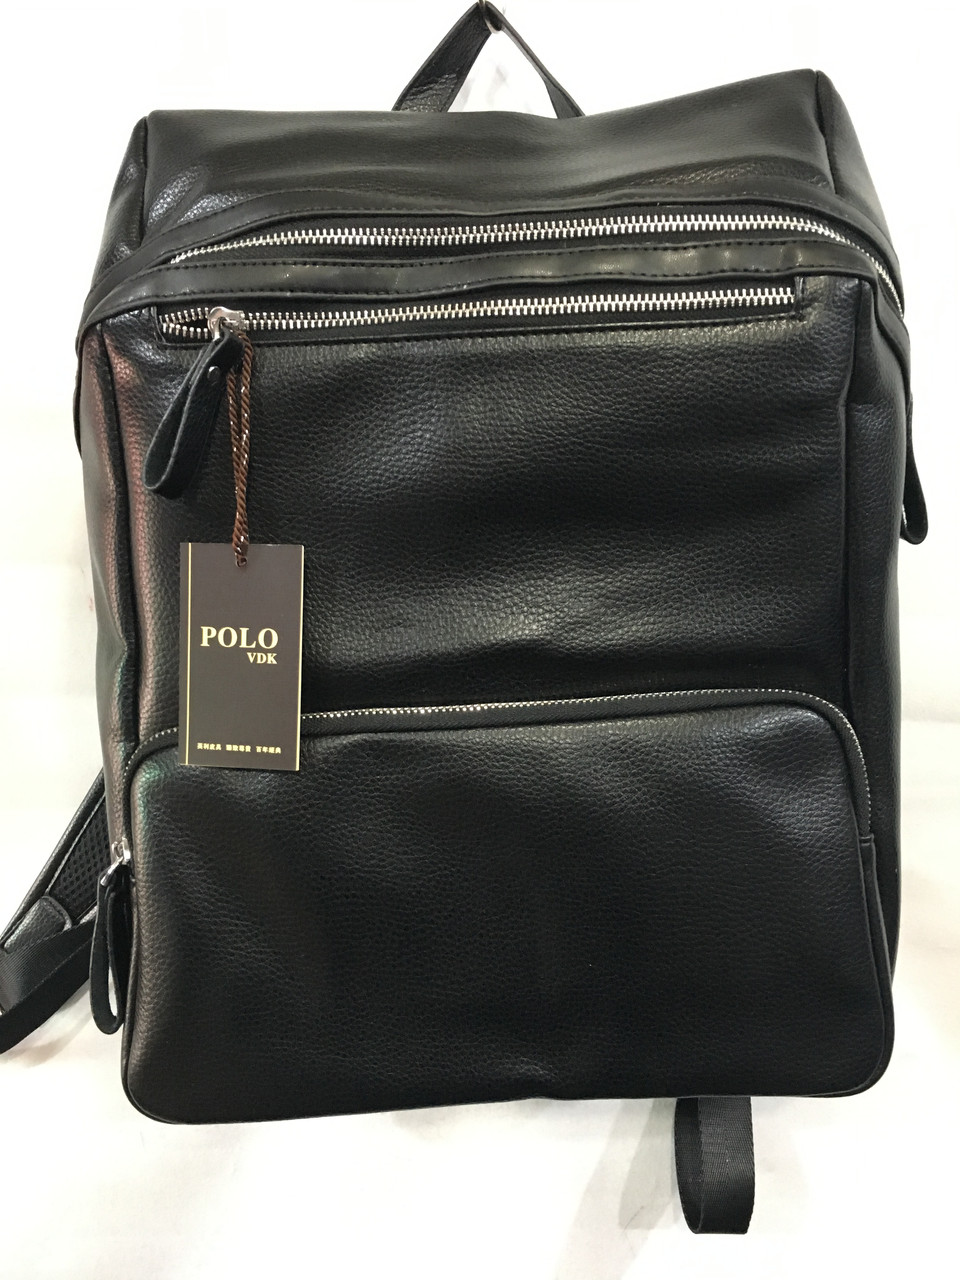 745caa7c25f7 Polo: продажа, цена в Одессе. мужские сумки и барсетки от